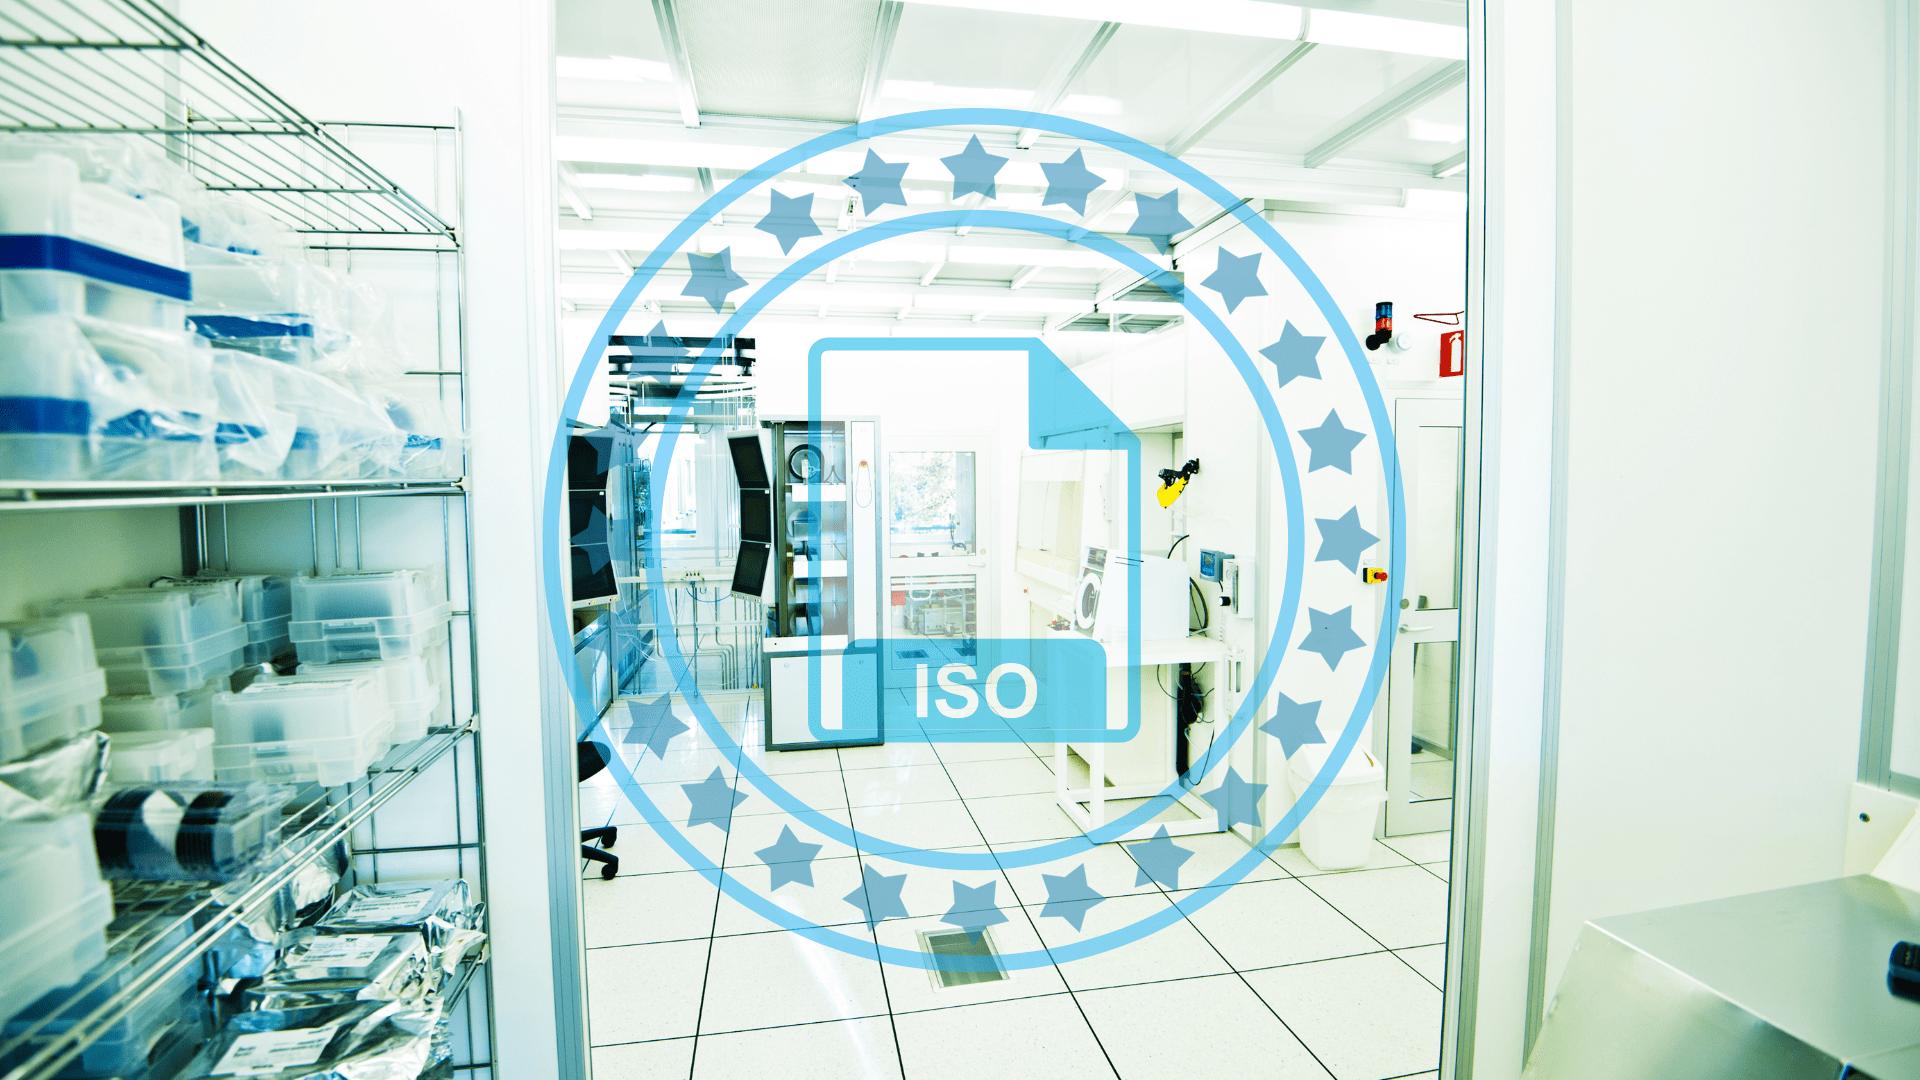 ISO 13485 – DISPOSITIVI MEDICI